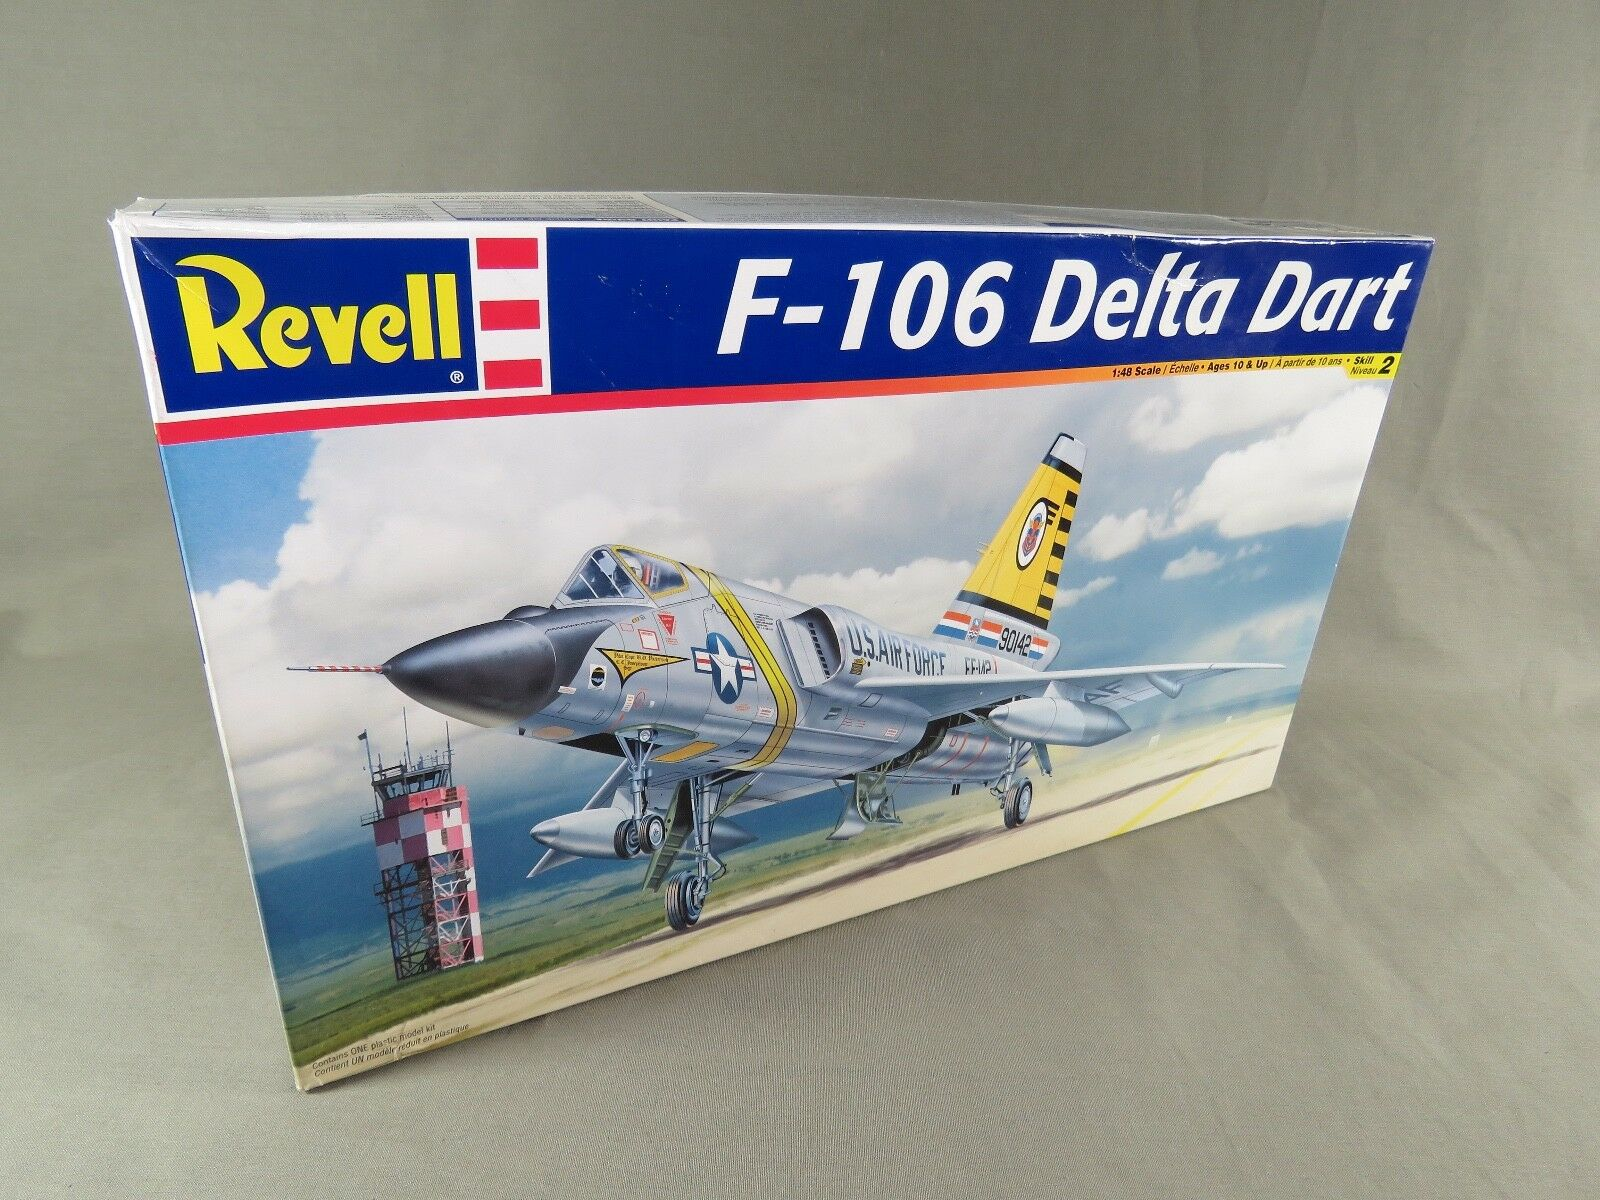 Revell F-106 Delta Dart 1 48 Scale US Air Force Interceptor Model Kit  2005 Obox